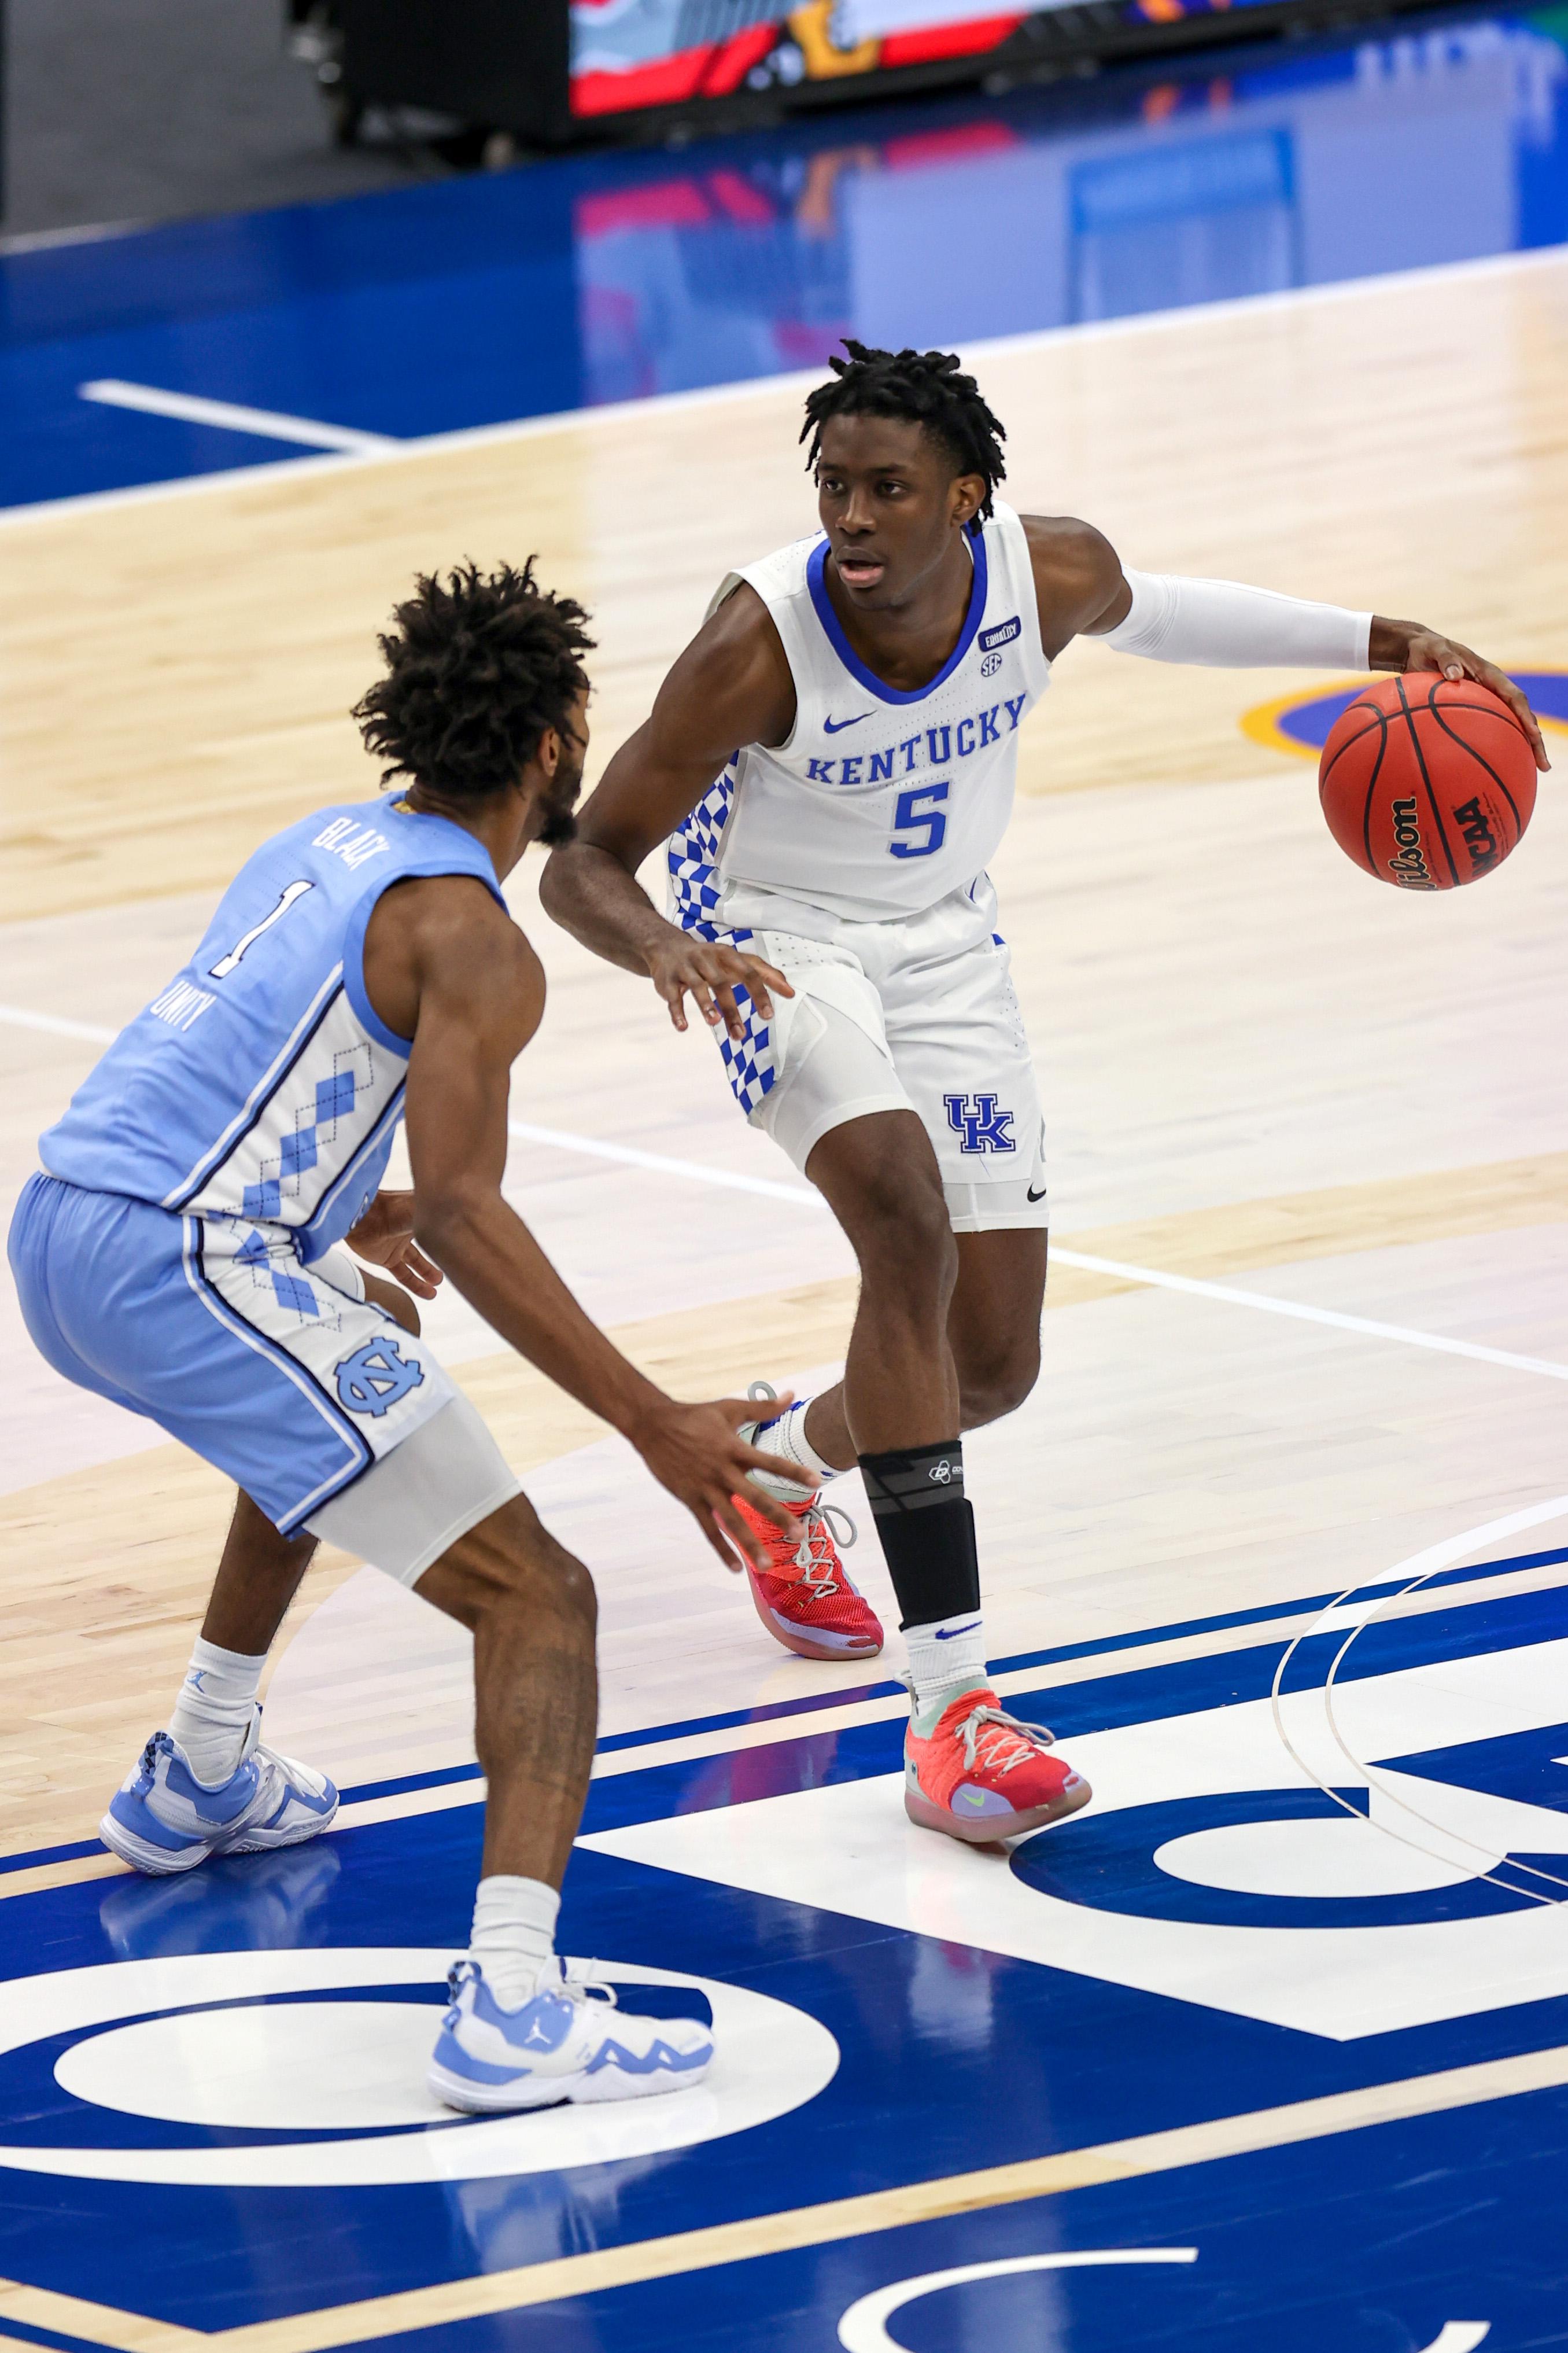 COLLEGE BASKETBALL: DEC 19 CBS Sports Classic - Kentucky v North Carolina